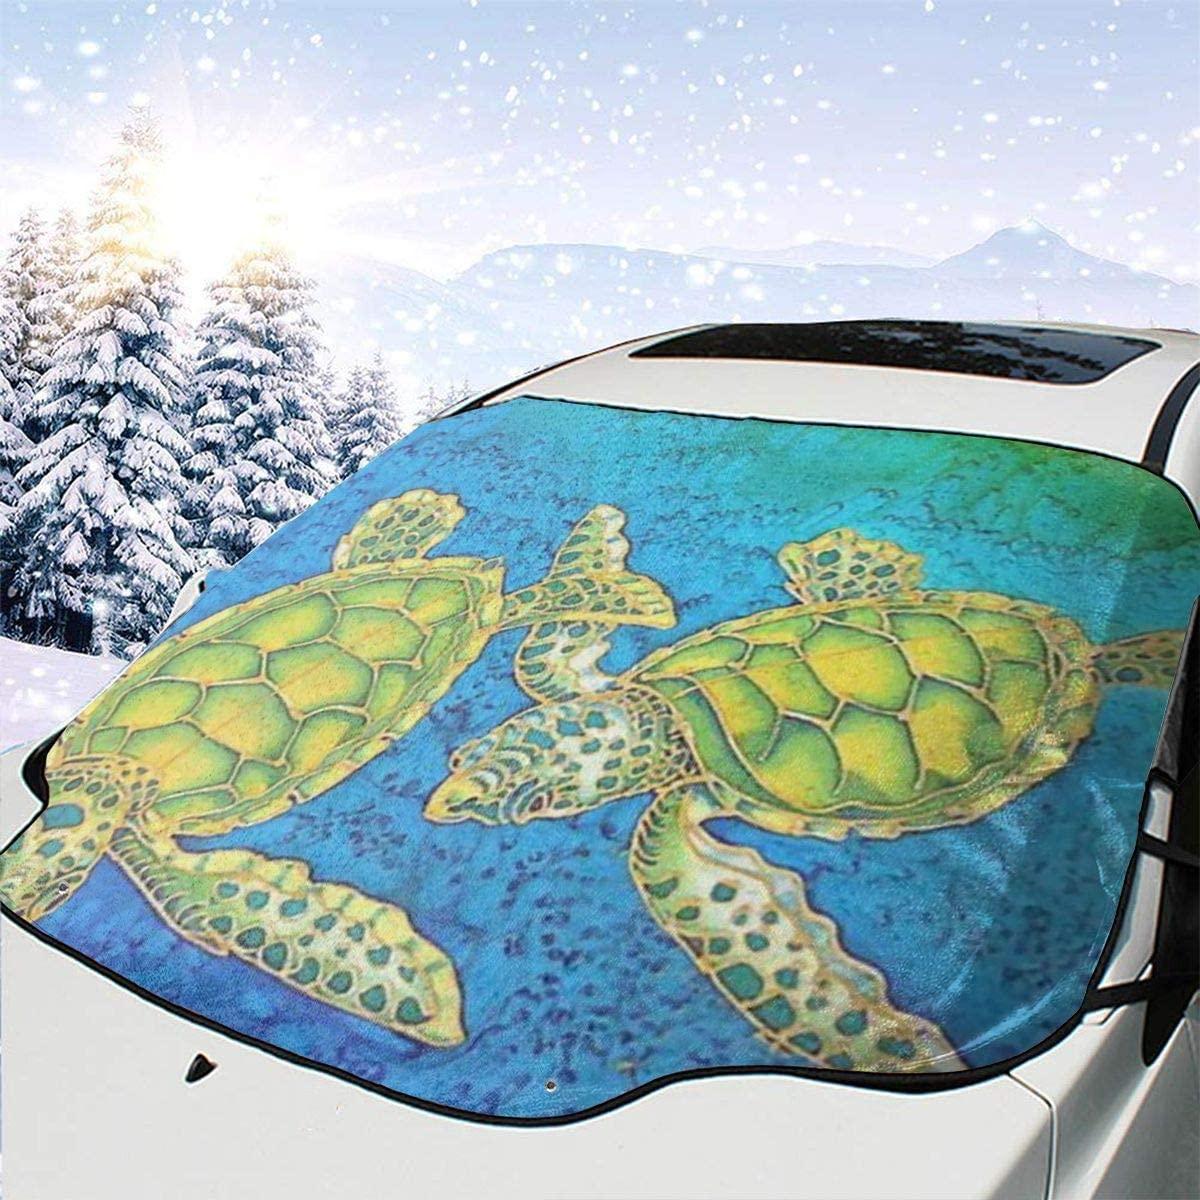 THONFIRE Car Front Window Windshields Frost Sun Shade Sea Turtles Cover Rainproof Blocks Heat Keeps Your Vehicle Cool Visor Protector Minivan Autumn Heatshield